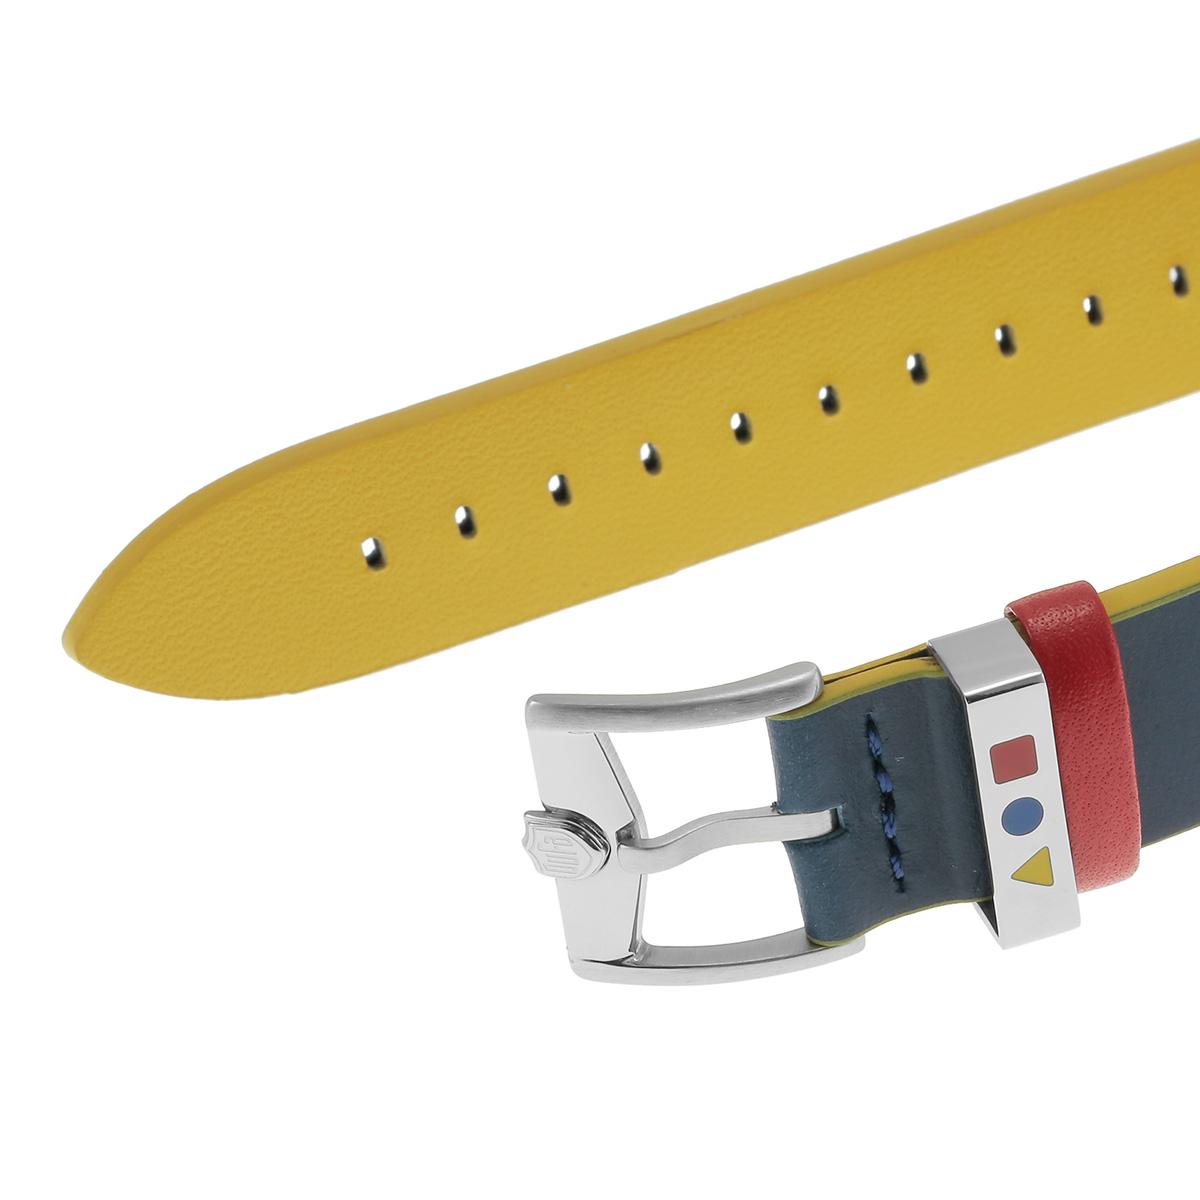 DUFA ドゥッファ バウハウス100周年記念モデル 腕時計 メンズ ワイマール WEJMAR DF-9006-0C